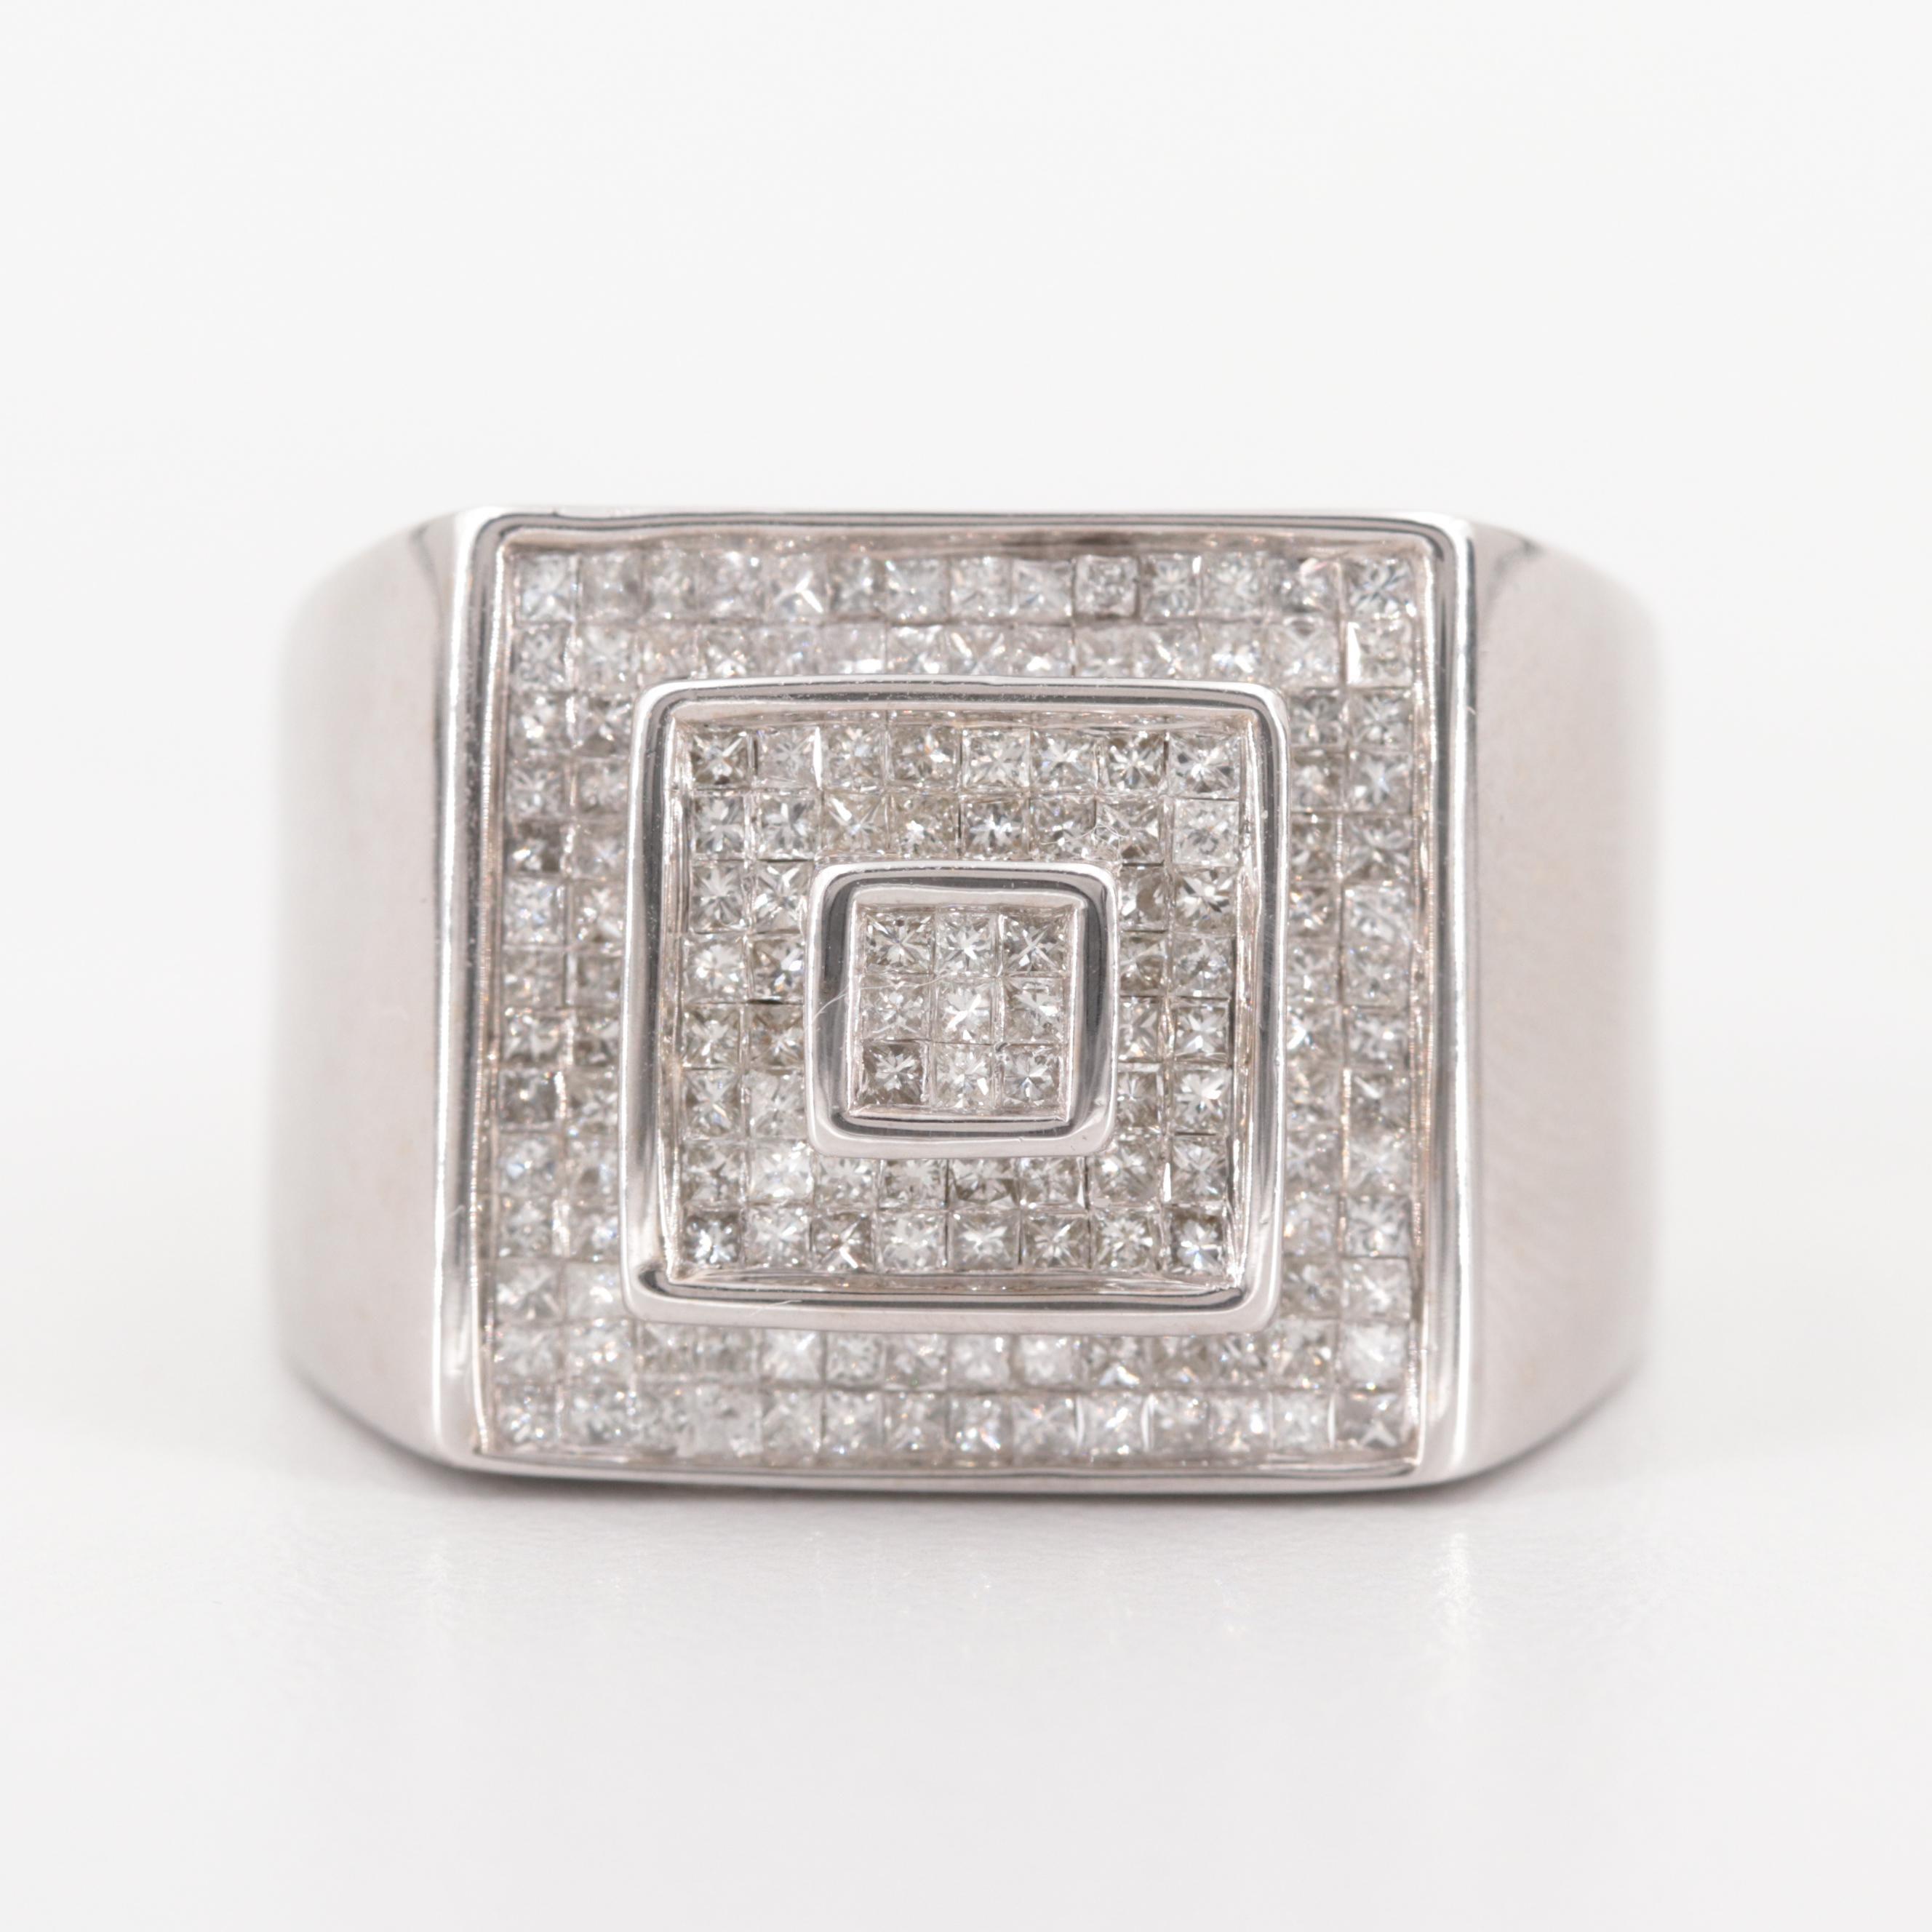 14K White Gold 2.54 CTW Diamond Ring